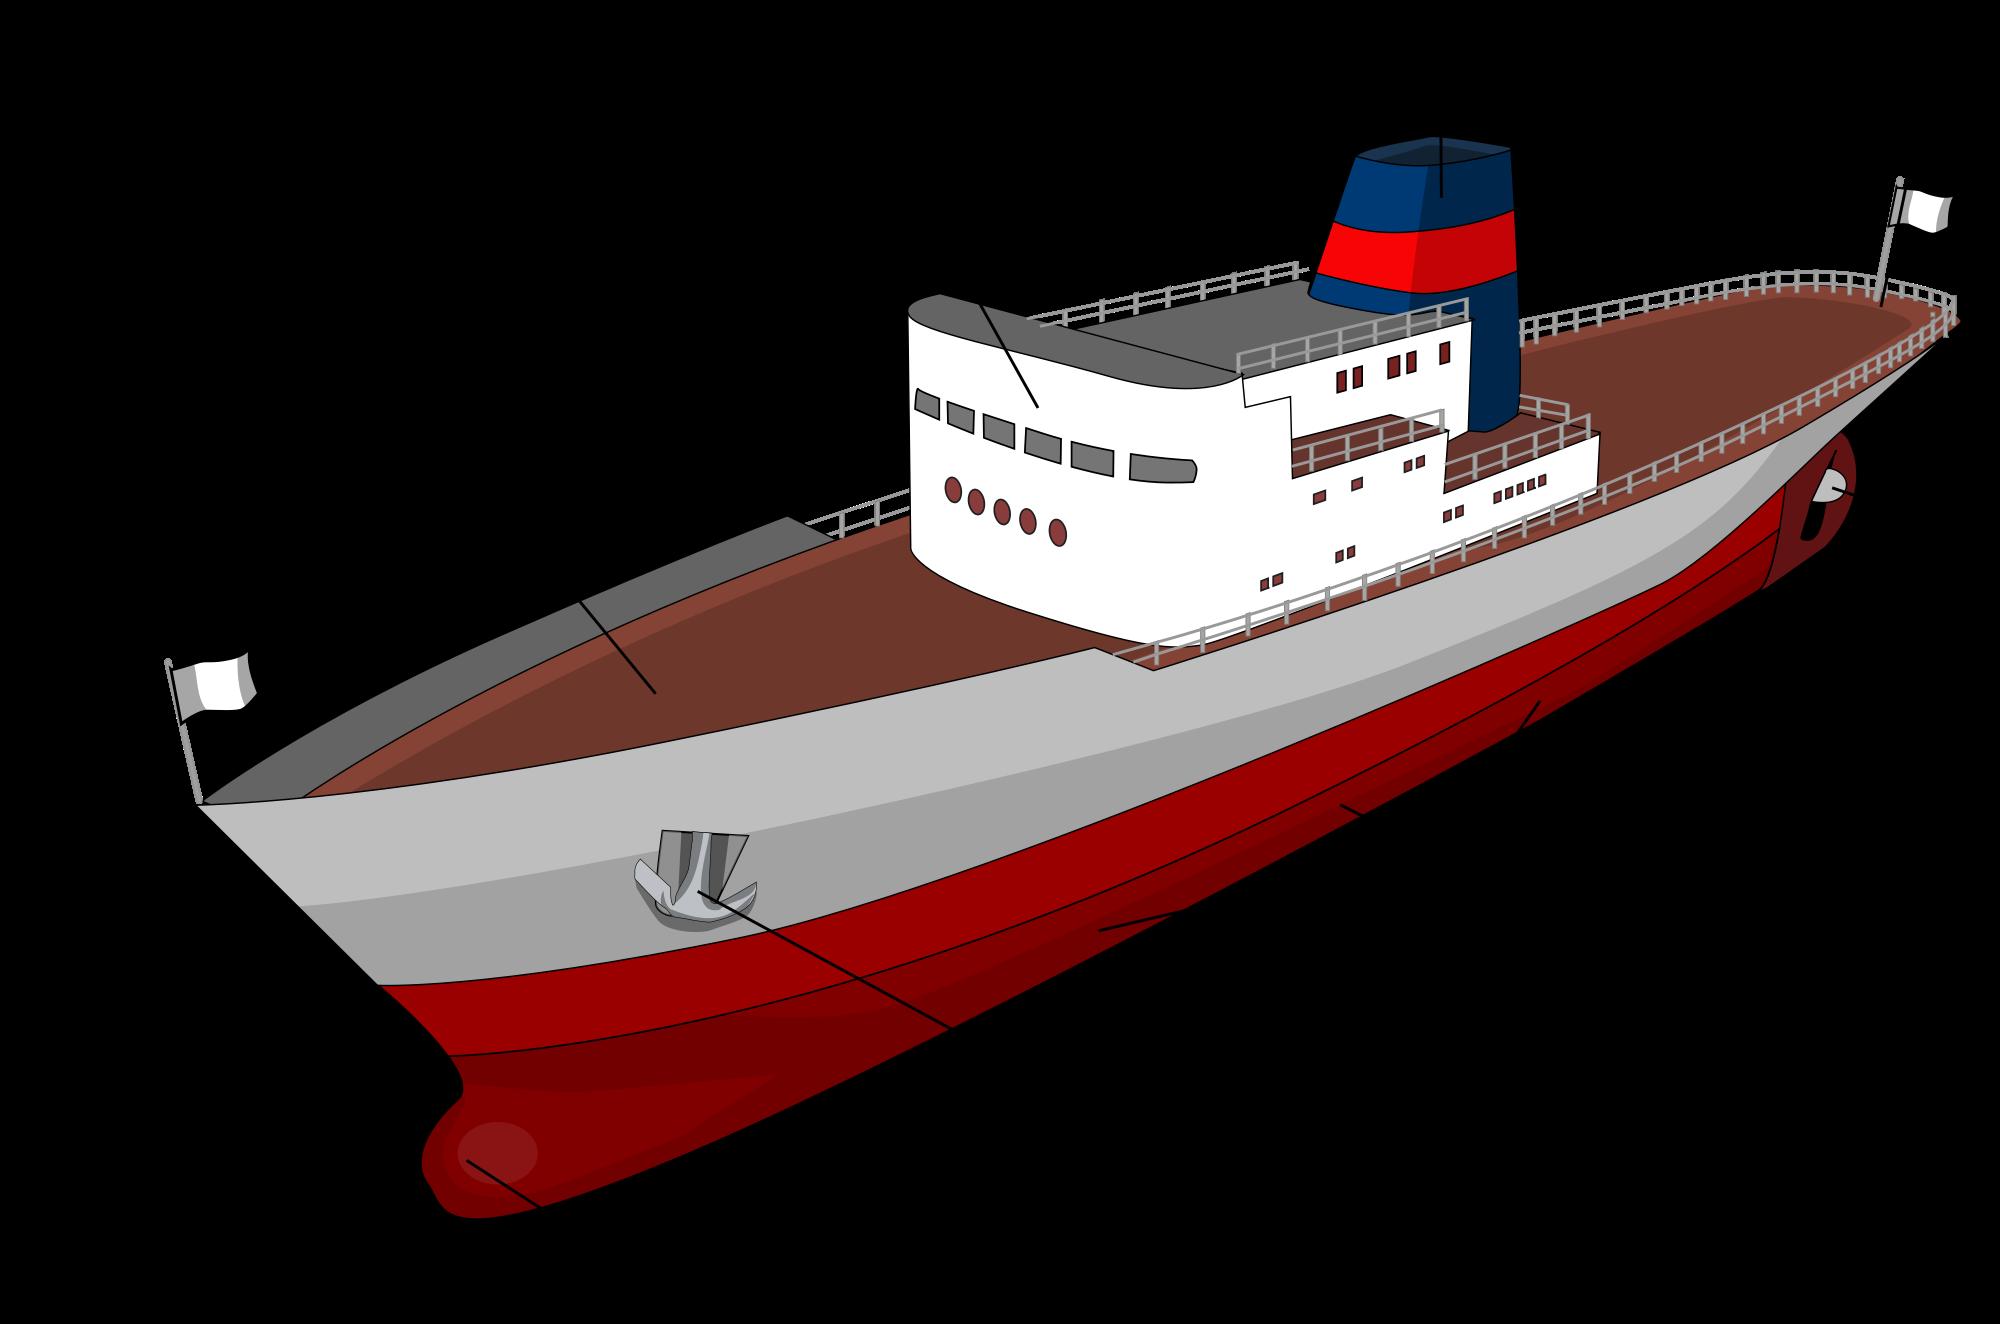 Cruise clipart barko. Png transparent images pluspng